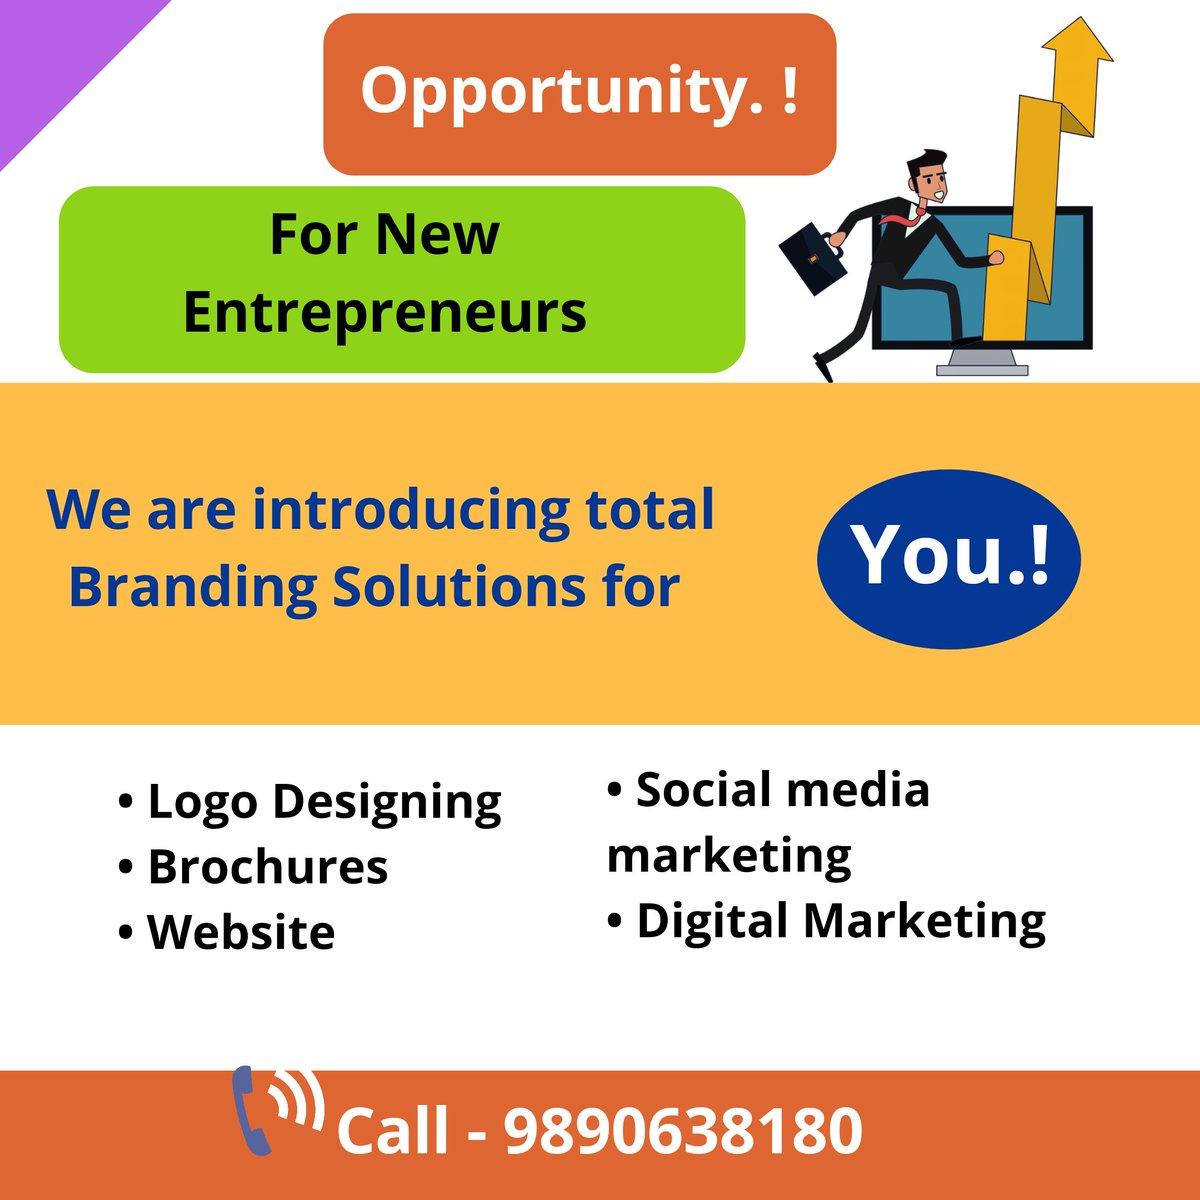 #websitedevelopment #webdevelopment #Website #webapp #Deprem #AhsokaTano #EliminacaoAFazenda #BlackFriday #we #WebsiteCost #Entrepreneurship #entrepreneur #Trending #Pune #OPPOxLaycon